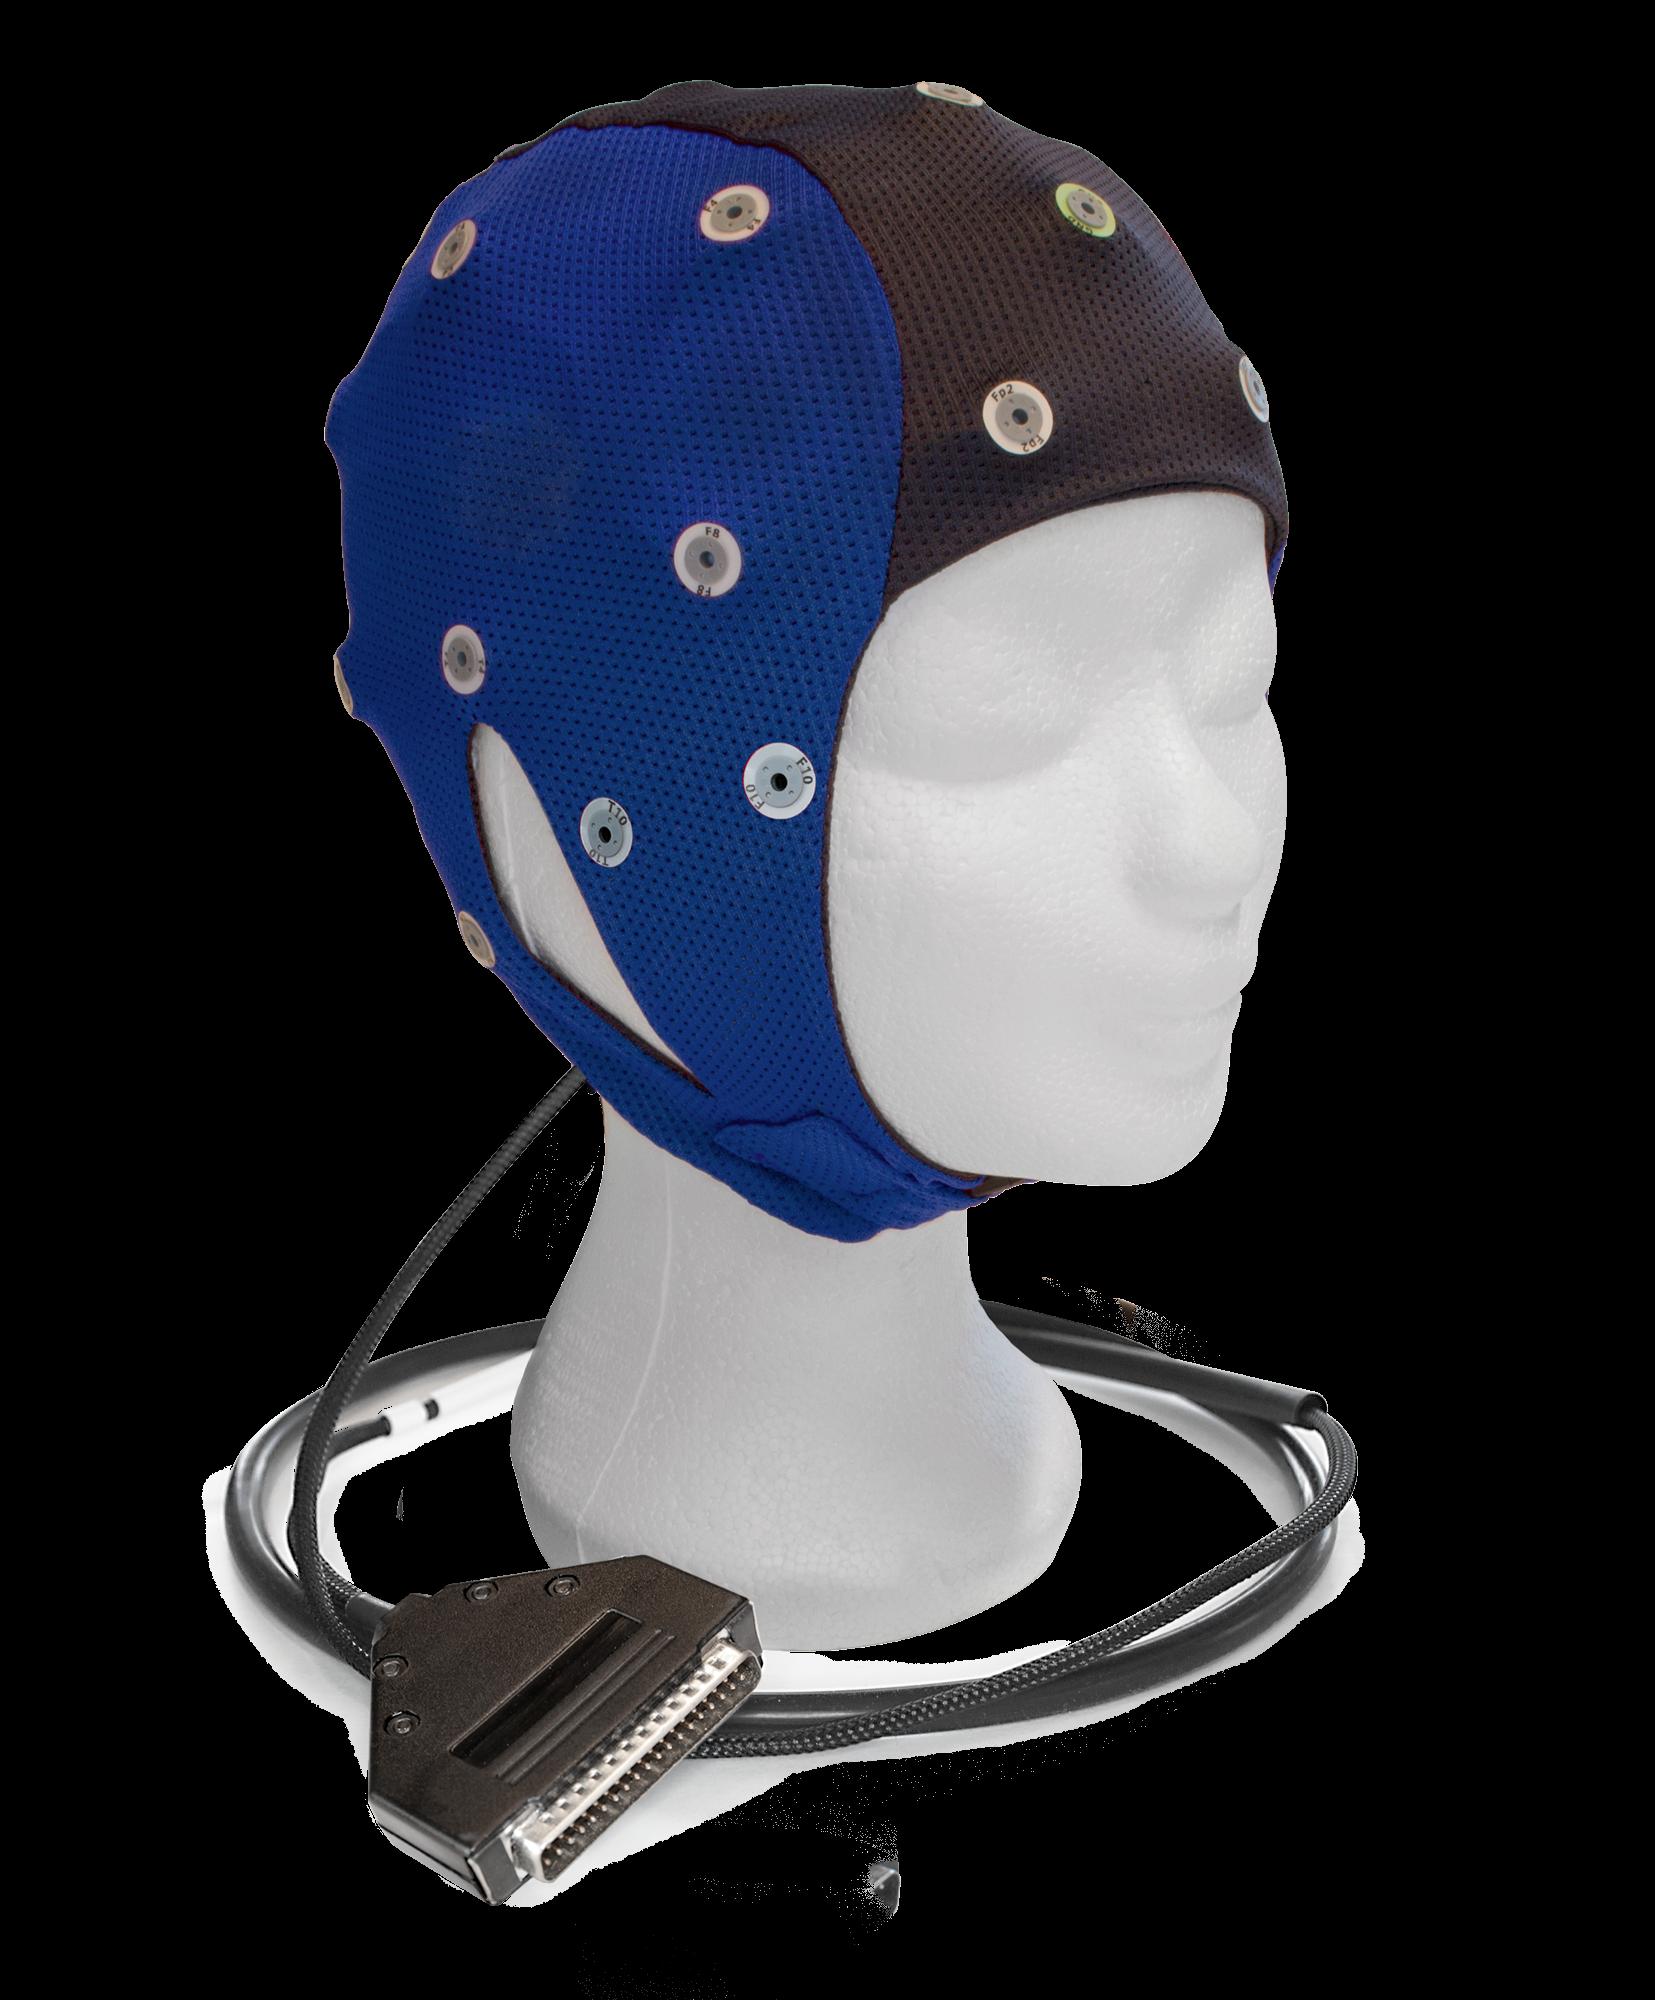 EEG čepice ANT-Neuro IFCN waveguard™ connect: L (56 – 61 cm, Modročerná)